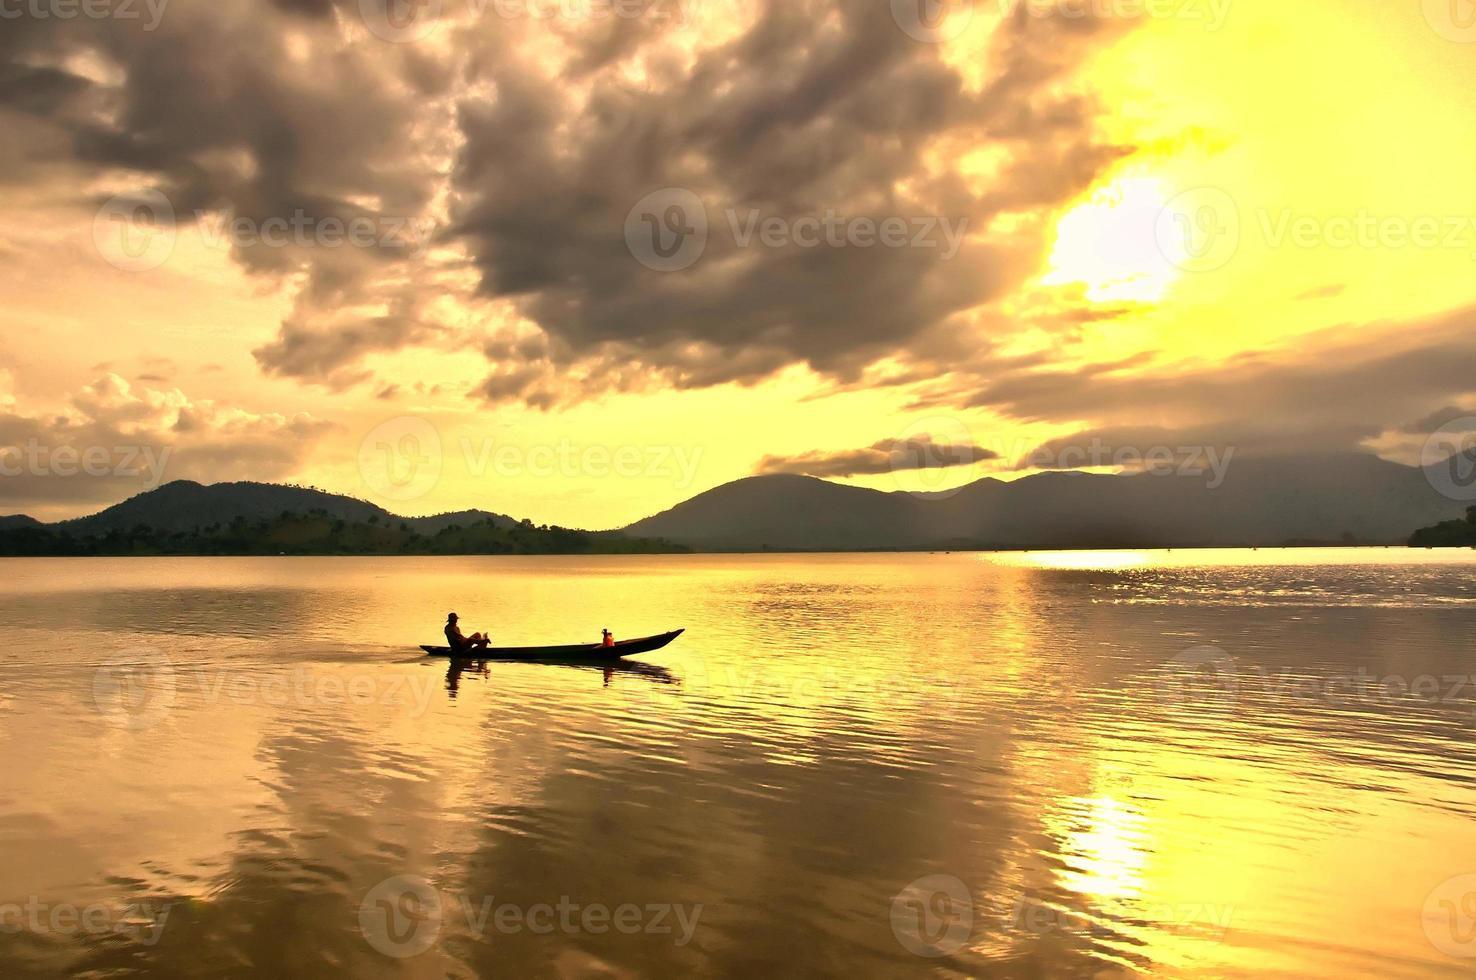 Fishman on Lake lake, Daklak, Buon Ma Thuoc, Vietnam photo